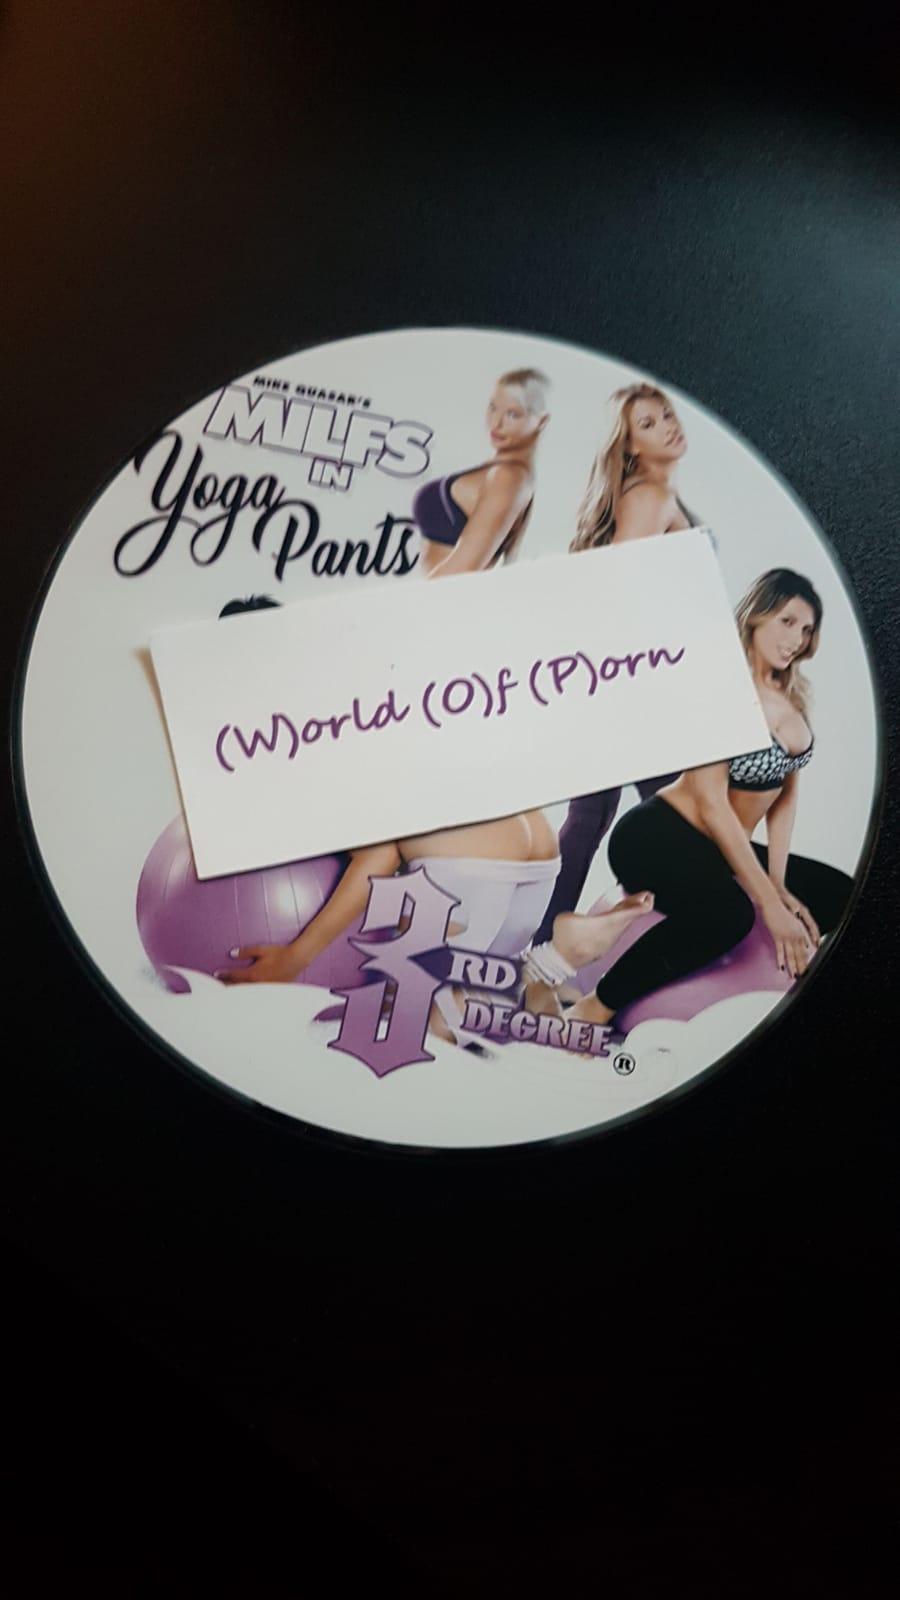 Milfs in Yoga Pants XXX DVDRip x264-WOP